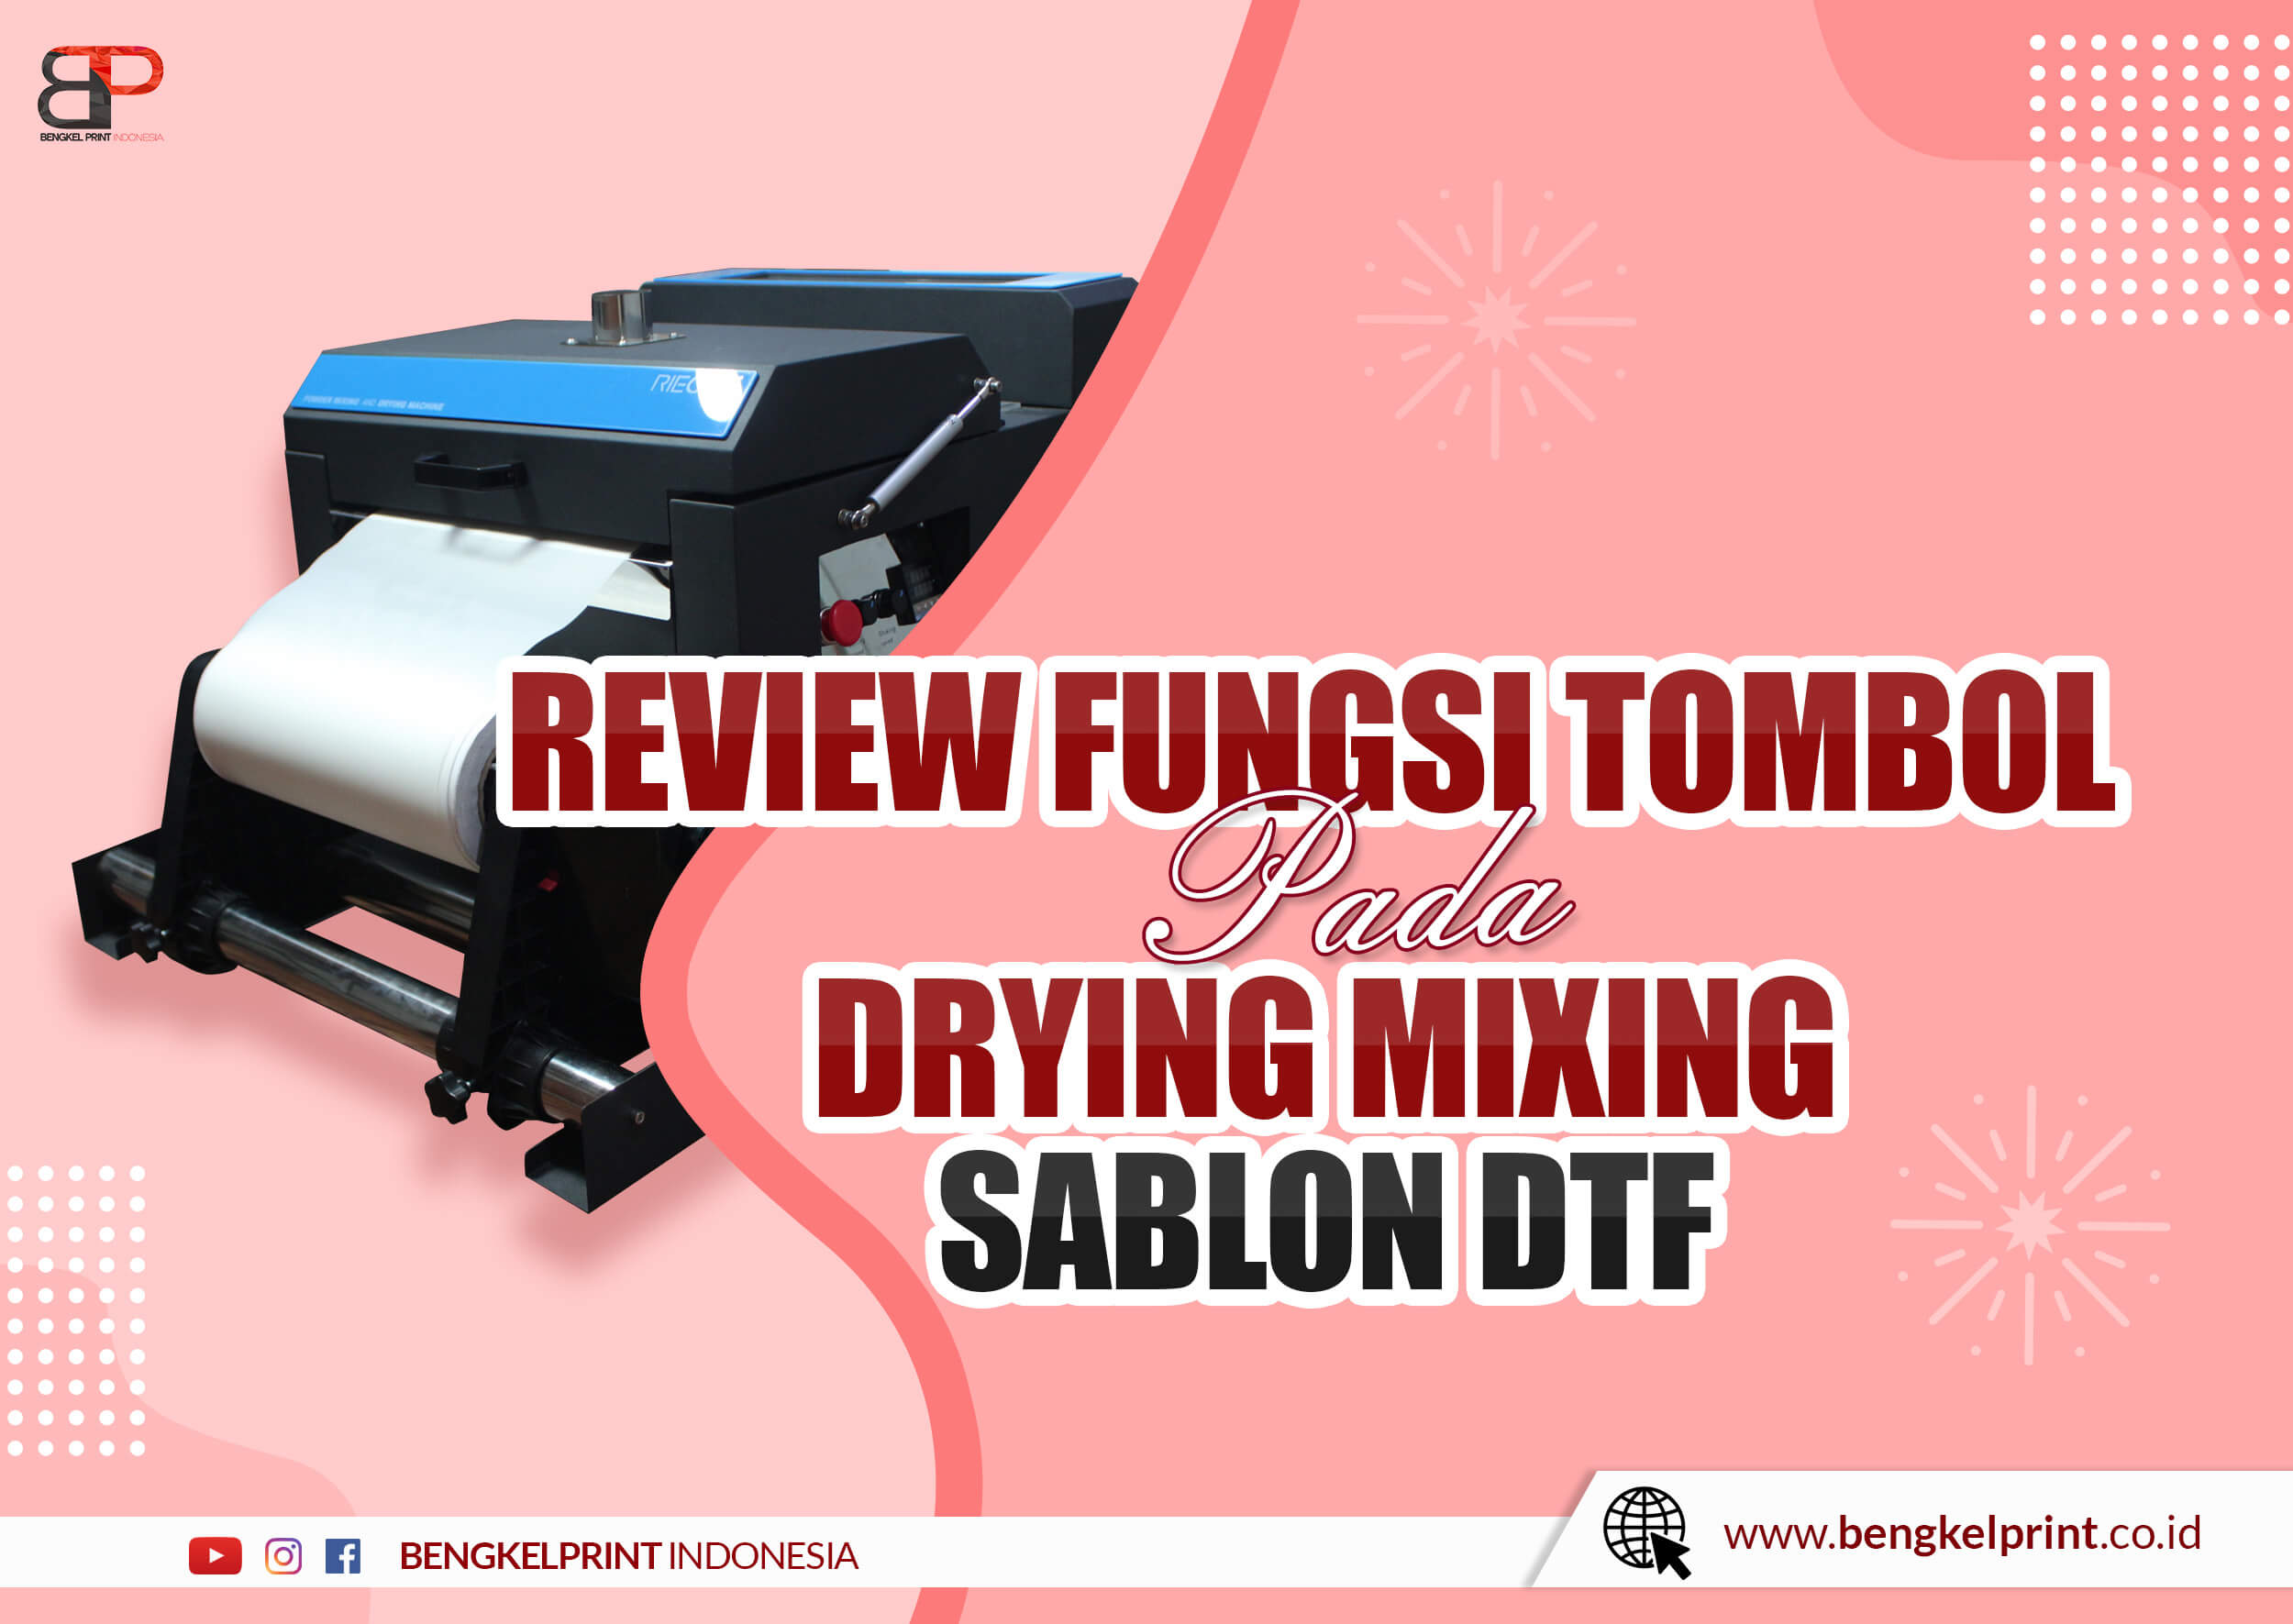 kelebihan 10 Fitur Tombol Mesin Drying Mixing Sablon DTF